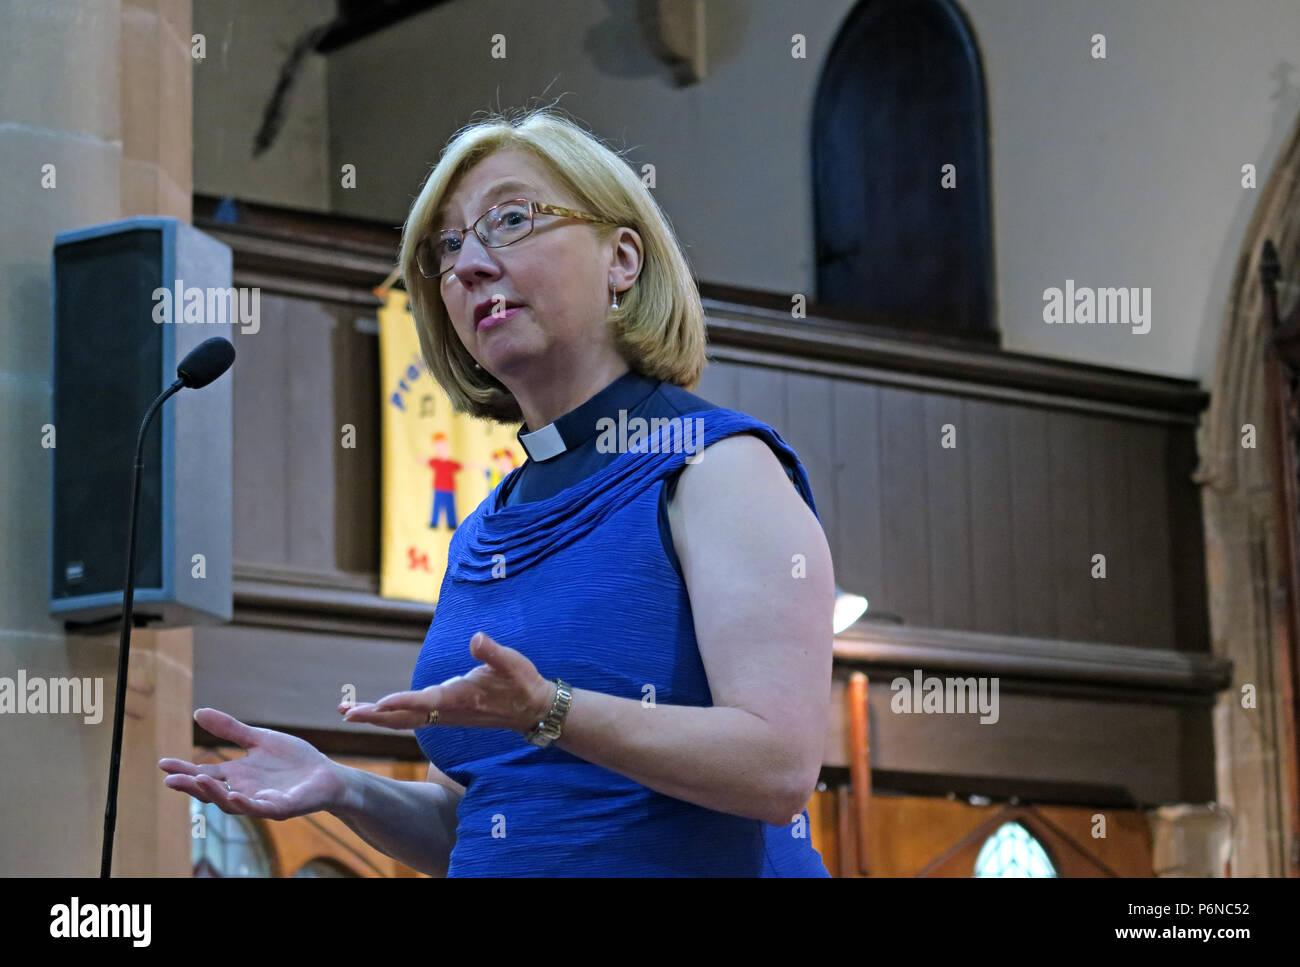 @Hotpixuk,GoTonySmith,female clergy,female,woman,vicar,Lymm,Rev,Bev,Beverley,Jameson,Beverley Jameson,Lymm Village,village,Warrington,Cheshire,WA13,Church Road,WA13 0QS,Anglican,Christian,Church Of England,speaking,at a,microphone,in church,Vicar,Vicar of Dibley